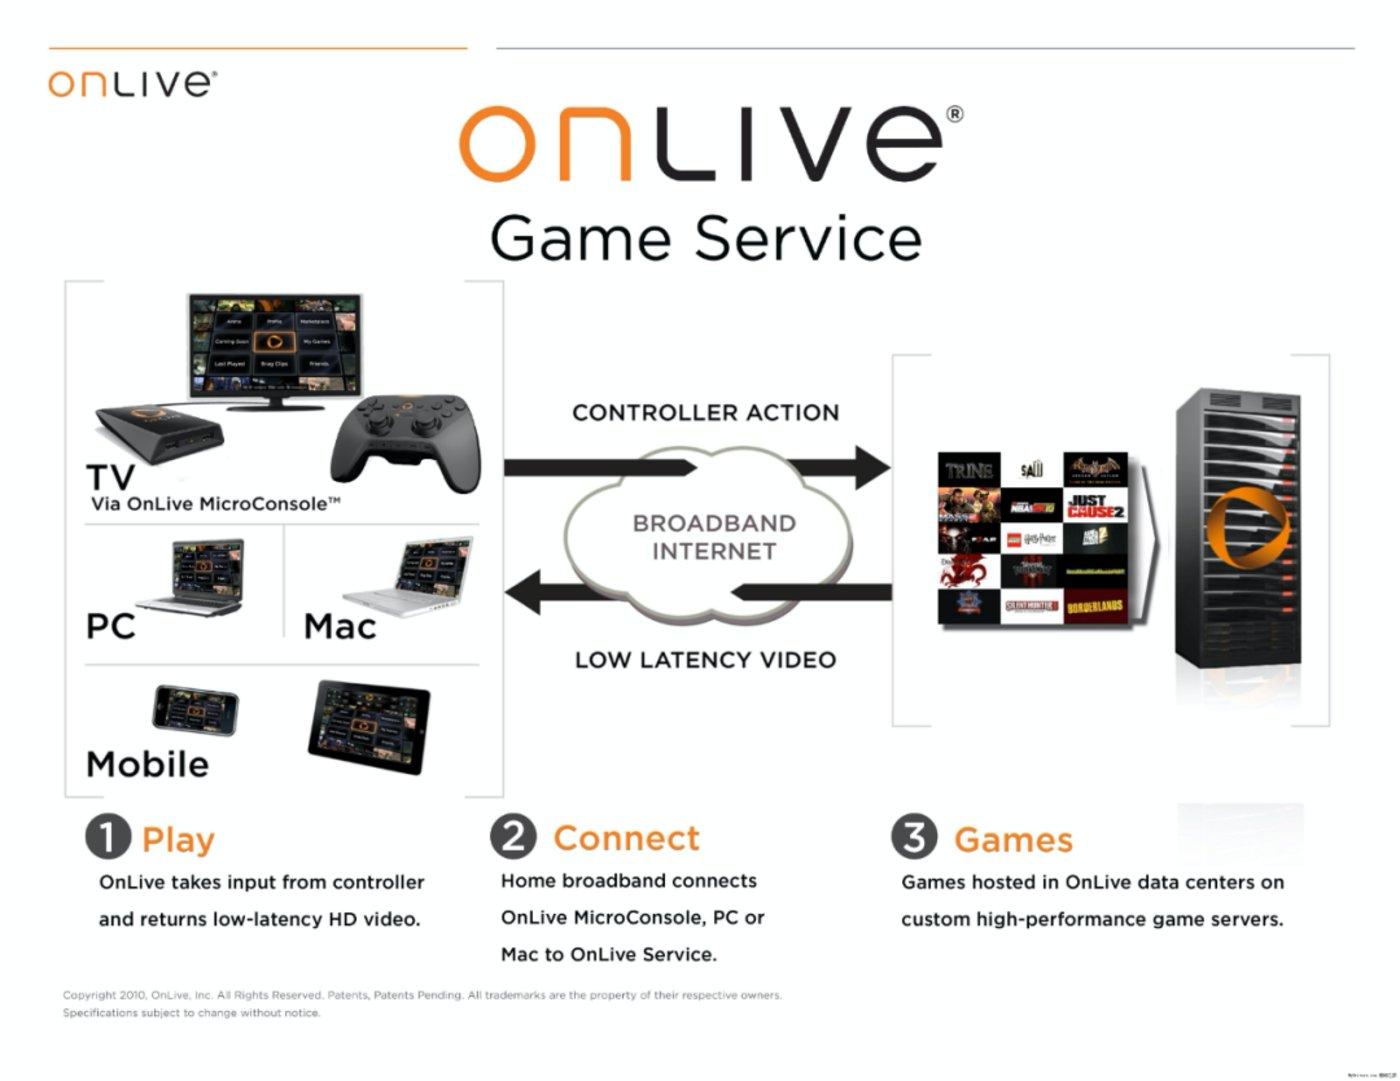 OnLive的游戏服务介绍